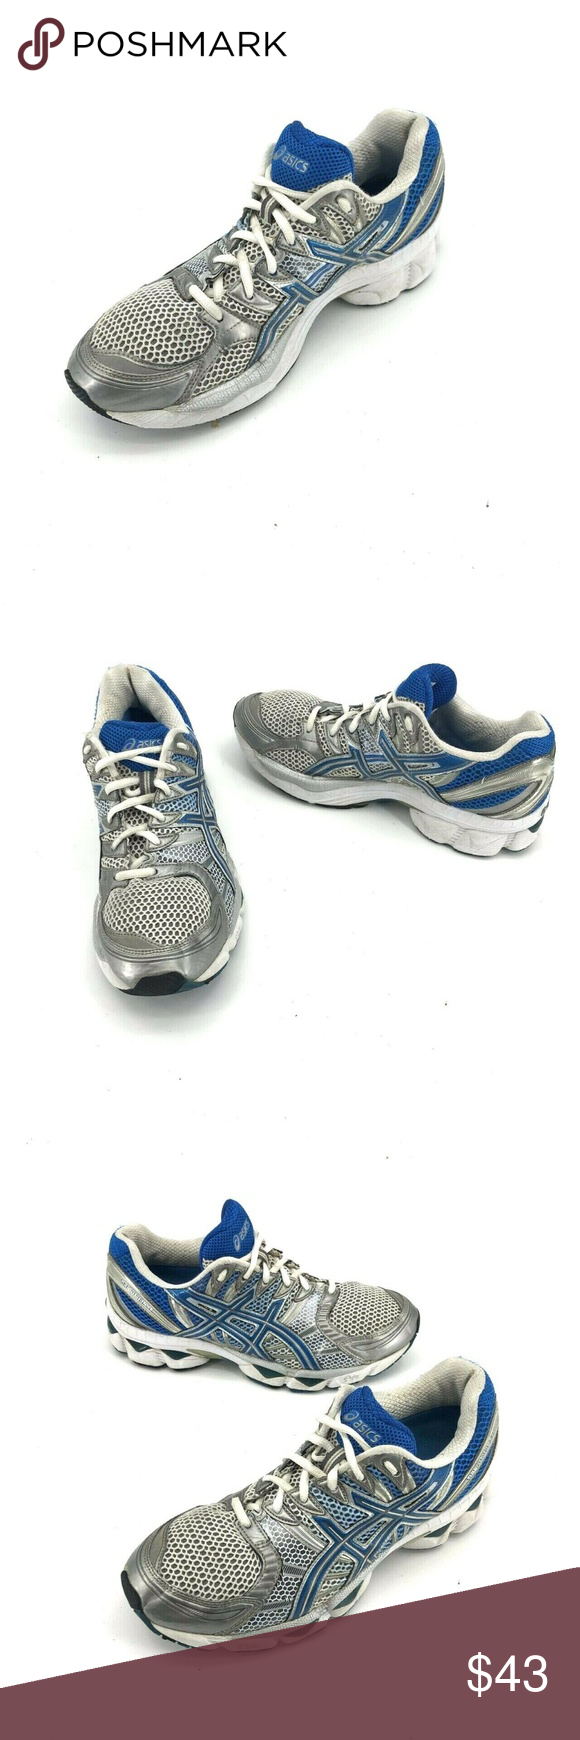 Asics Gel Nimbus T095N Running Shoes